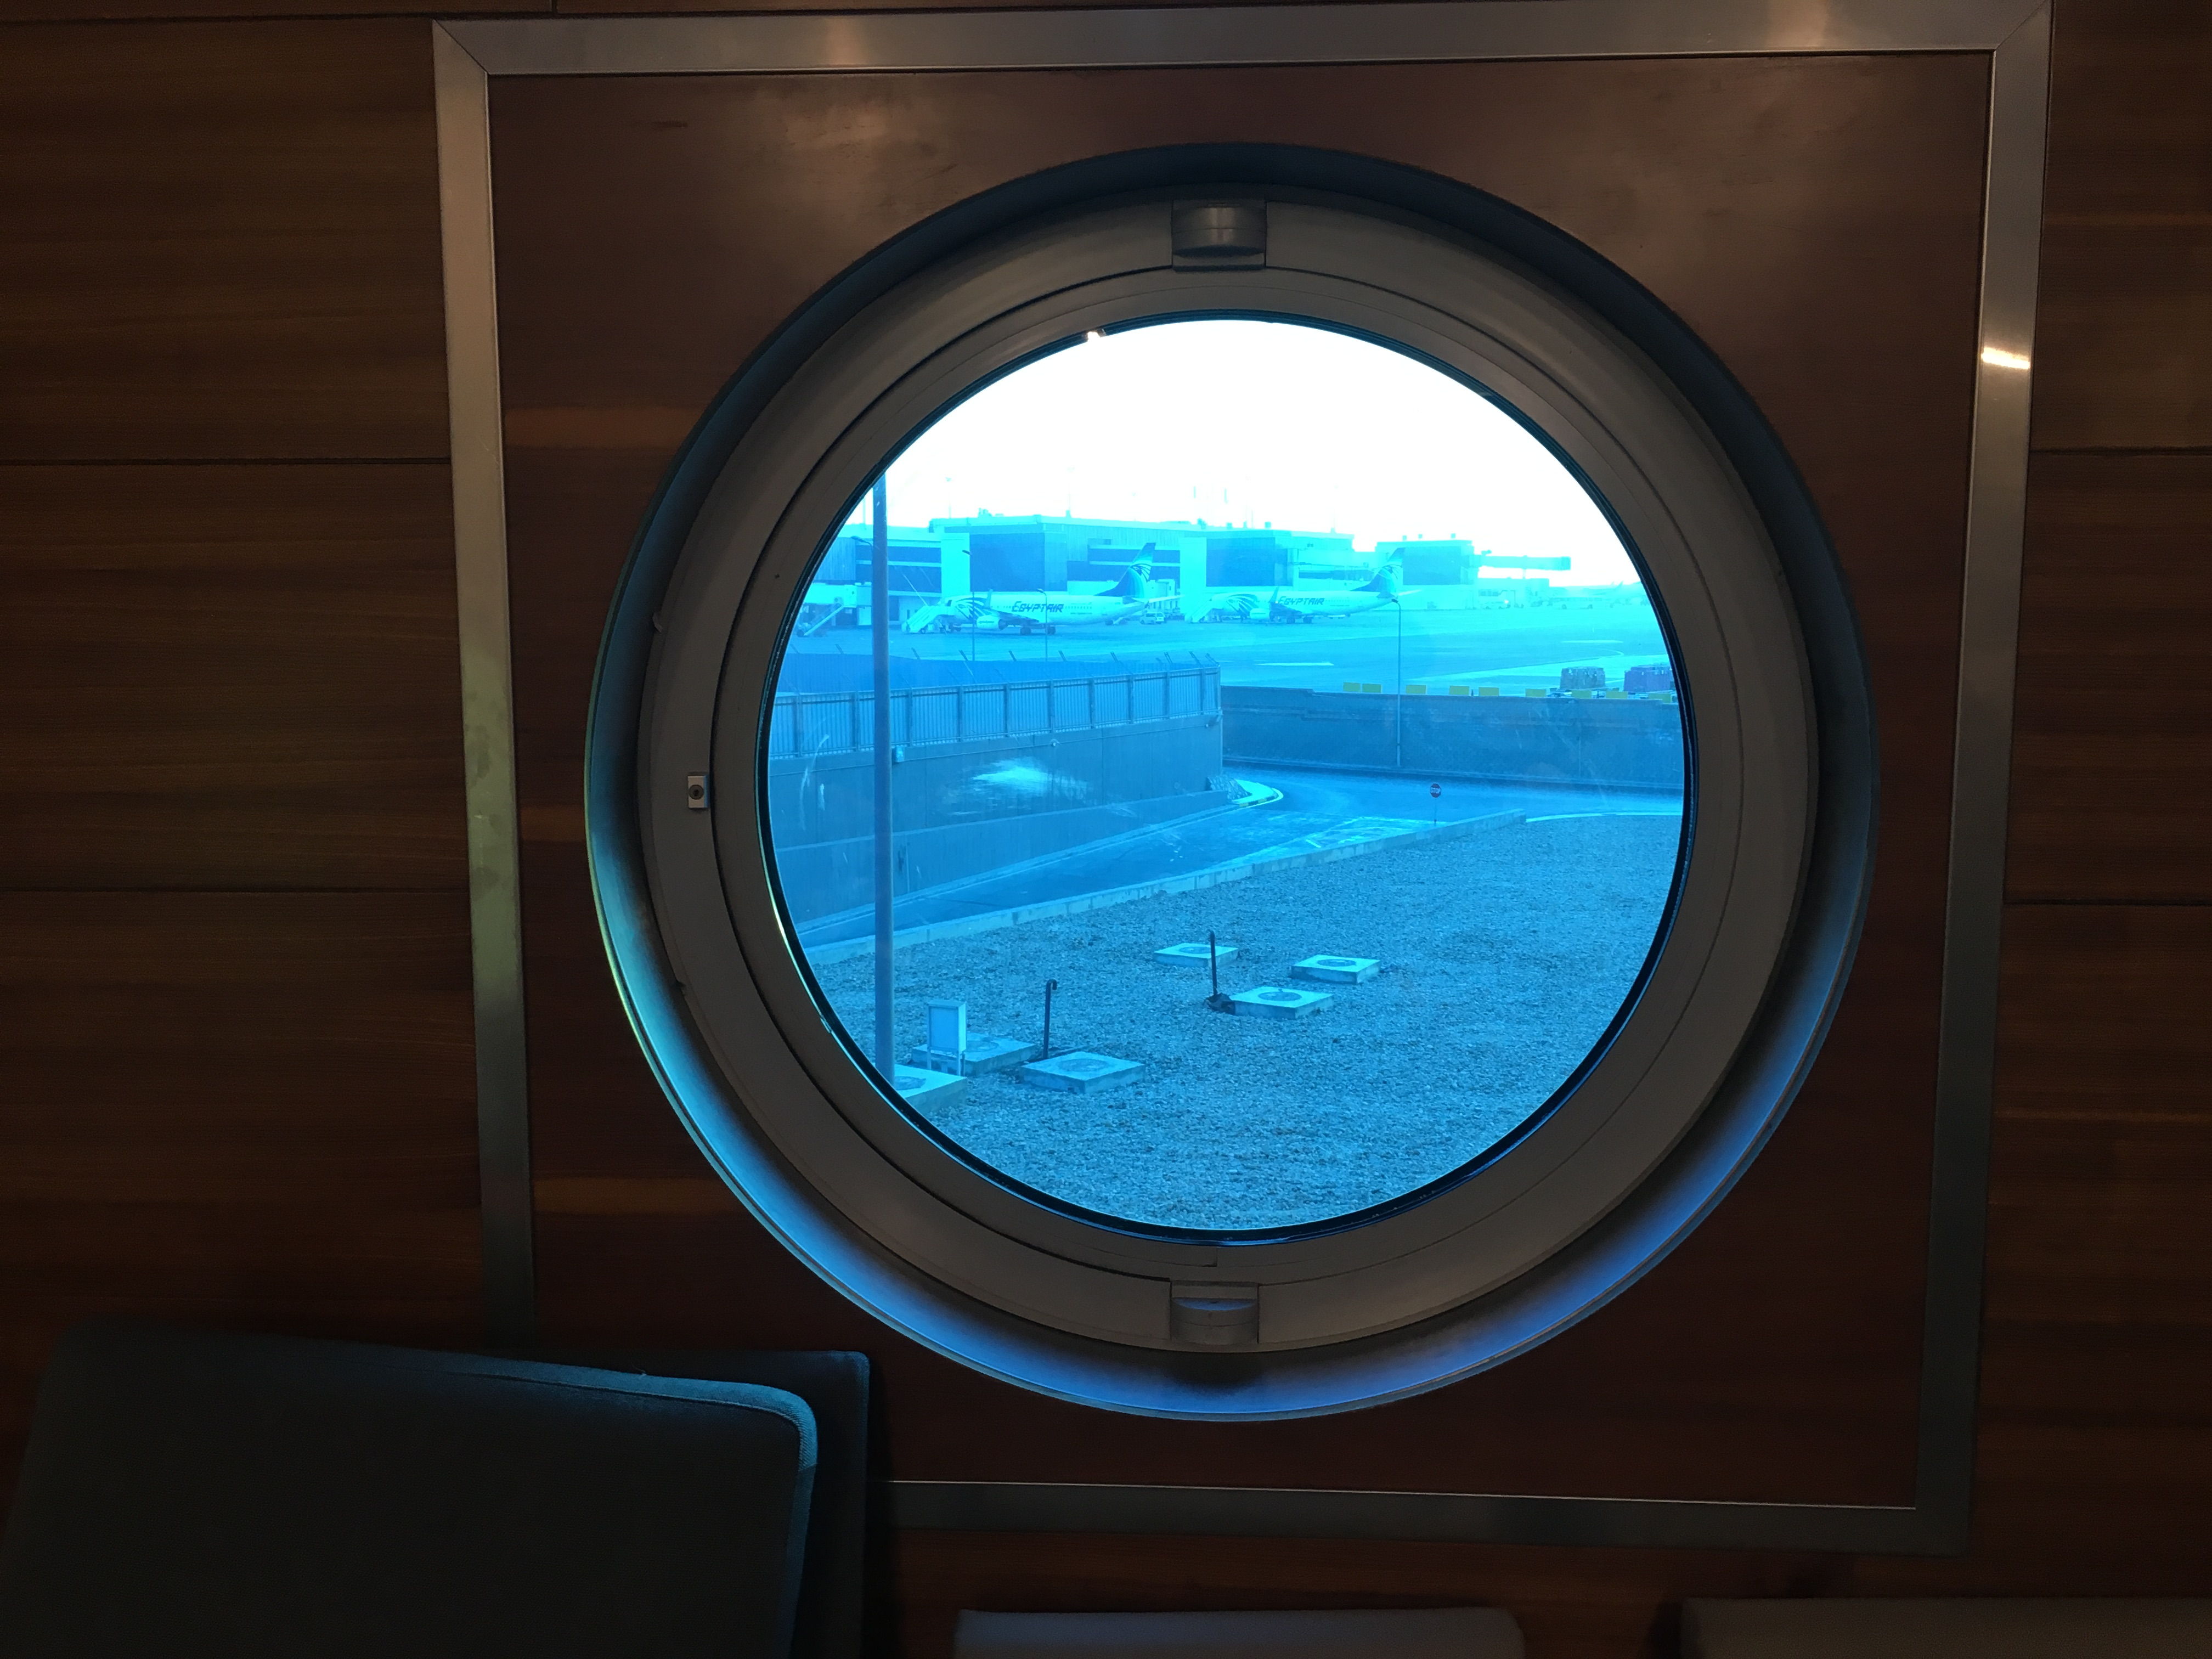 Lounge Review : カイロ空港(CAI) エジプト航空(MS) ALMEISANラウンジ